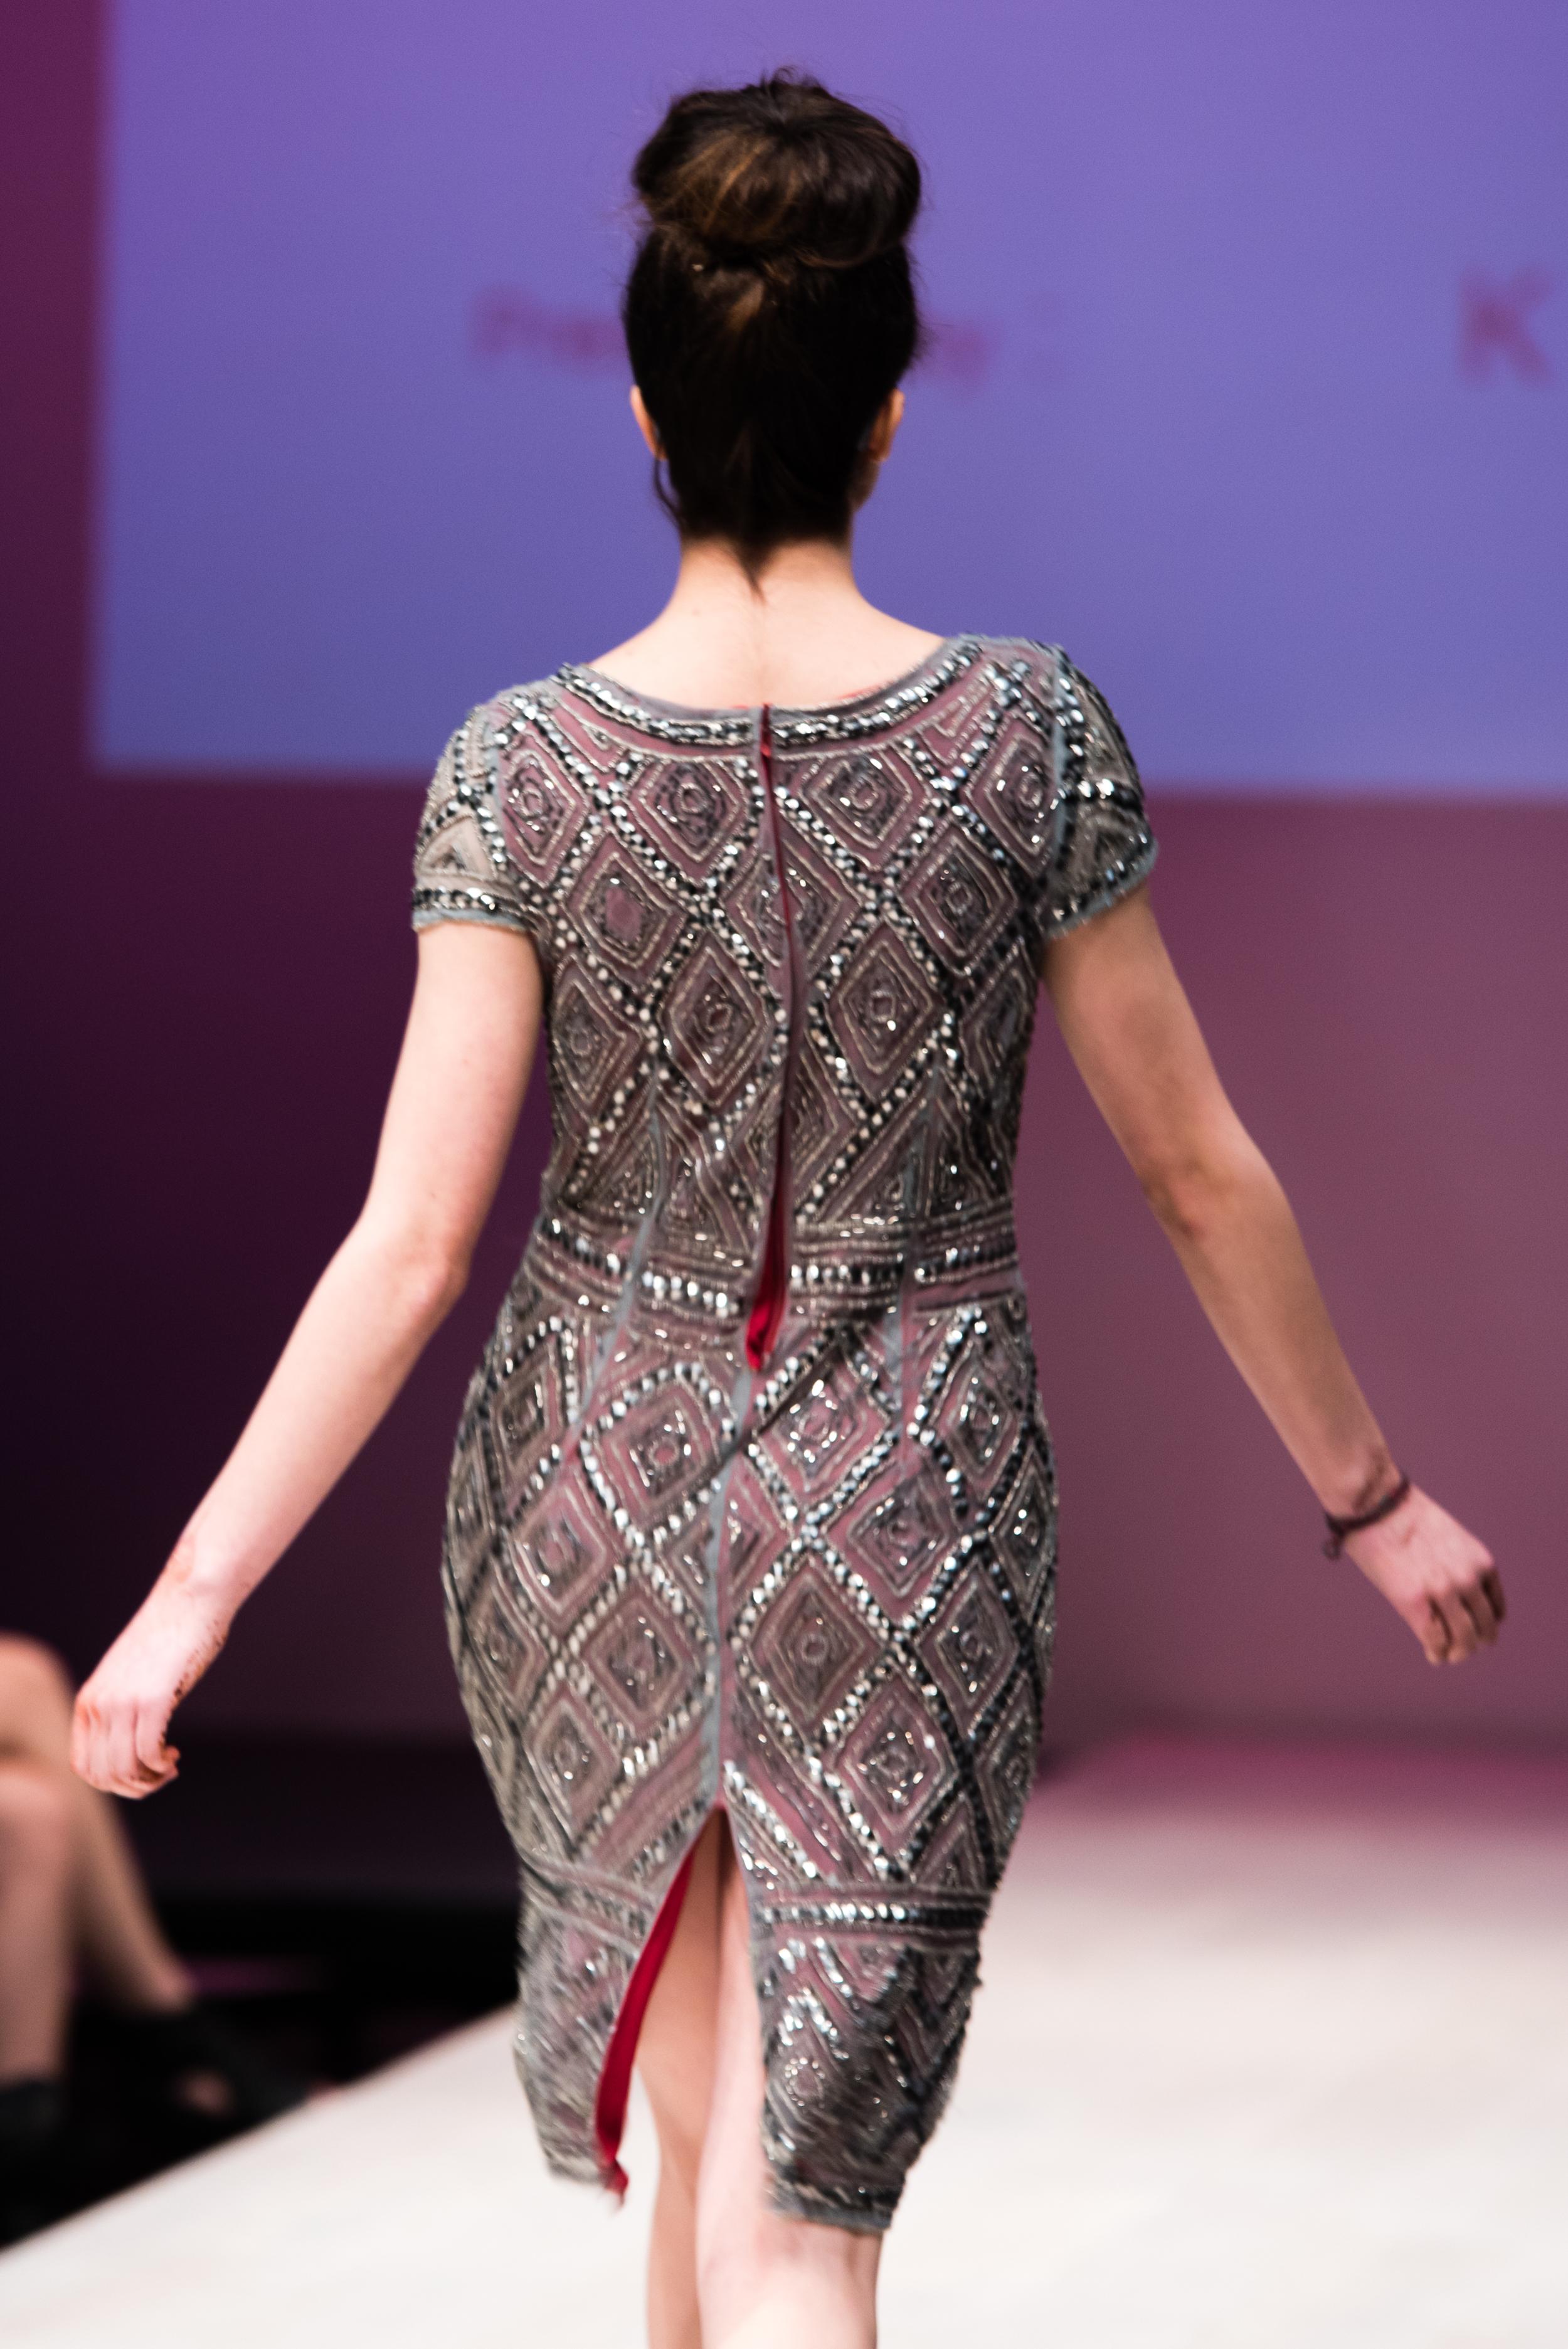 Sher Khan Niazi-WCFW-Shankar Couture-4556.jpg